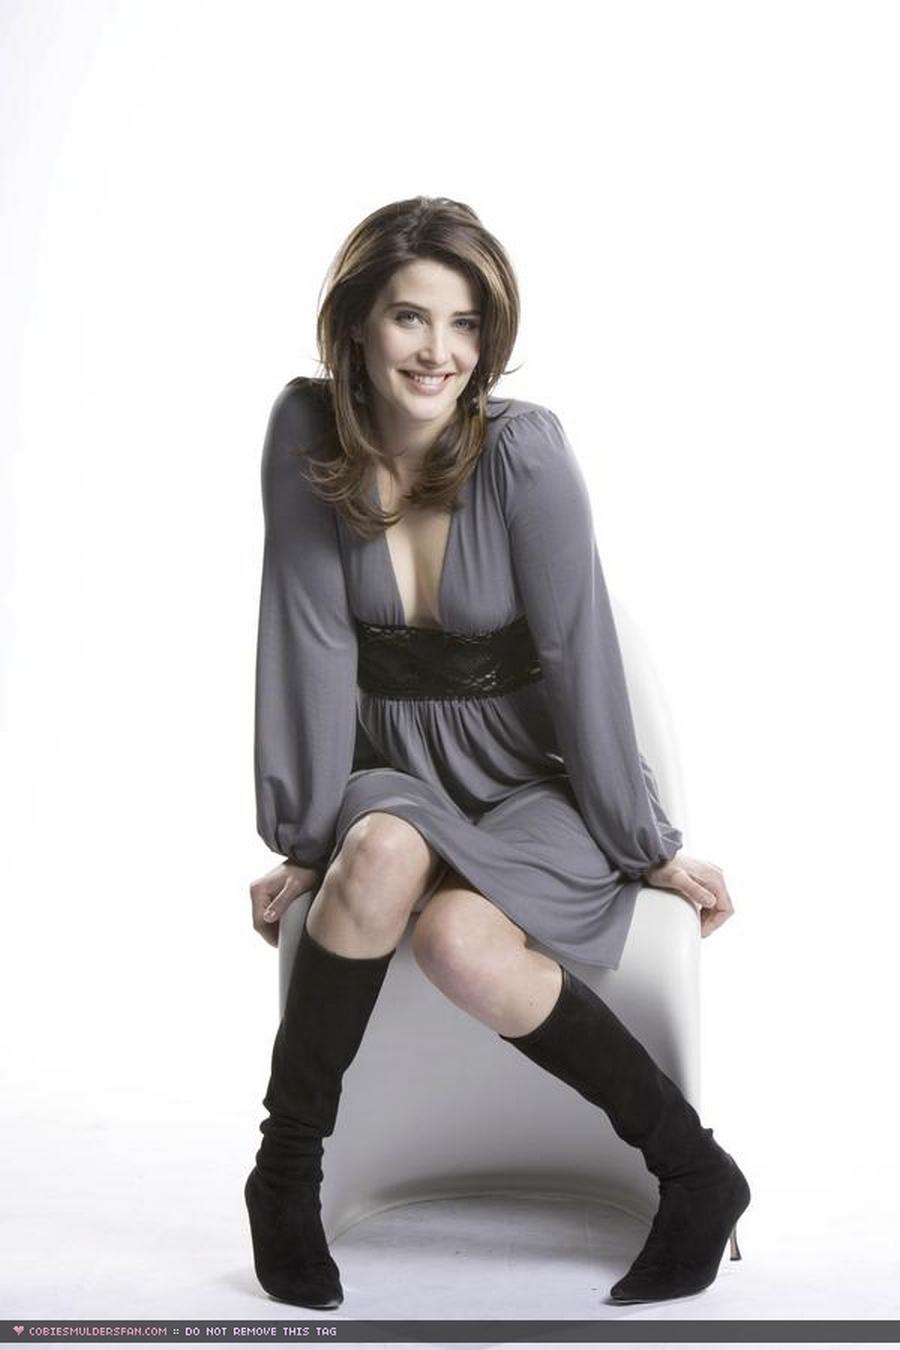 Jivebunnys Female Celebrity Picture Gallery: Cobie ...